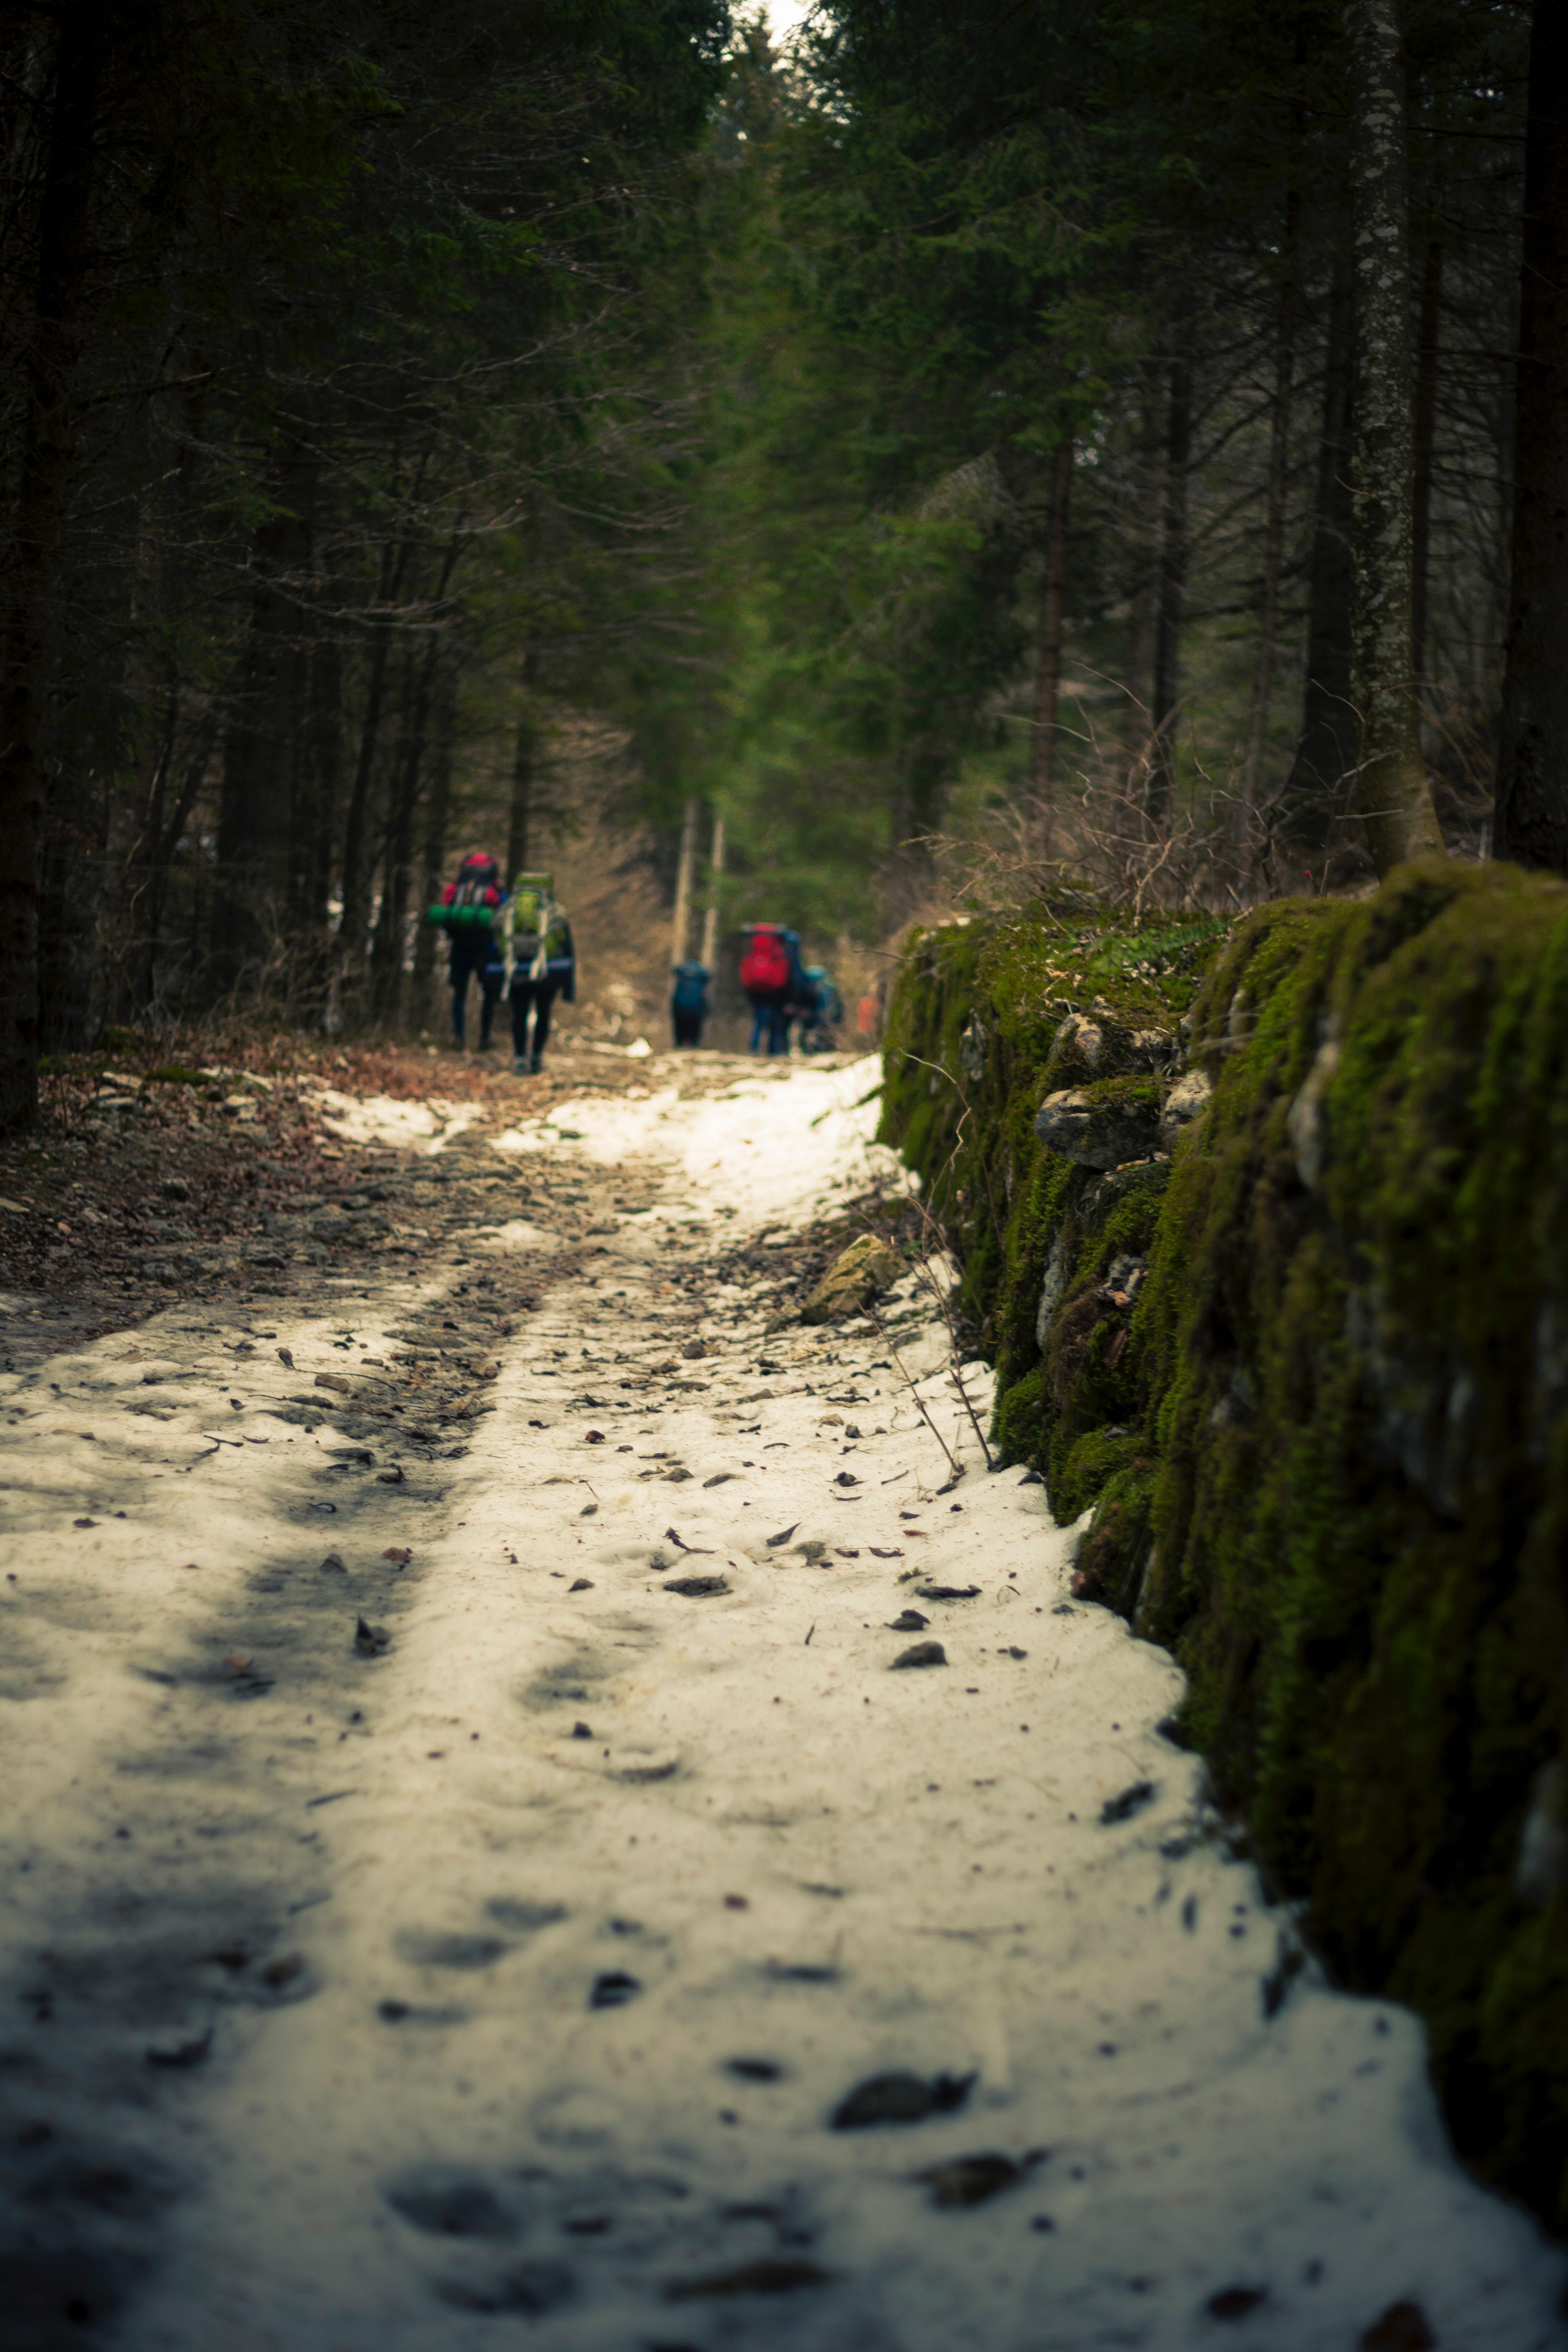 Macro Photography of Snowy Terrain, Daylight, Scenic, Winter, Weather, HQ Photo